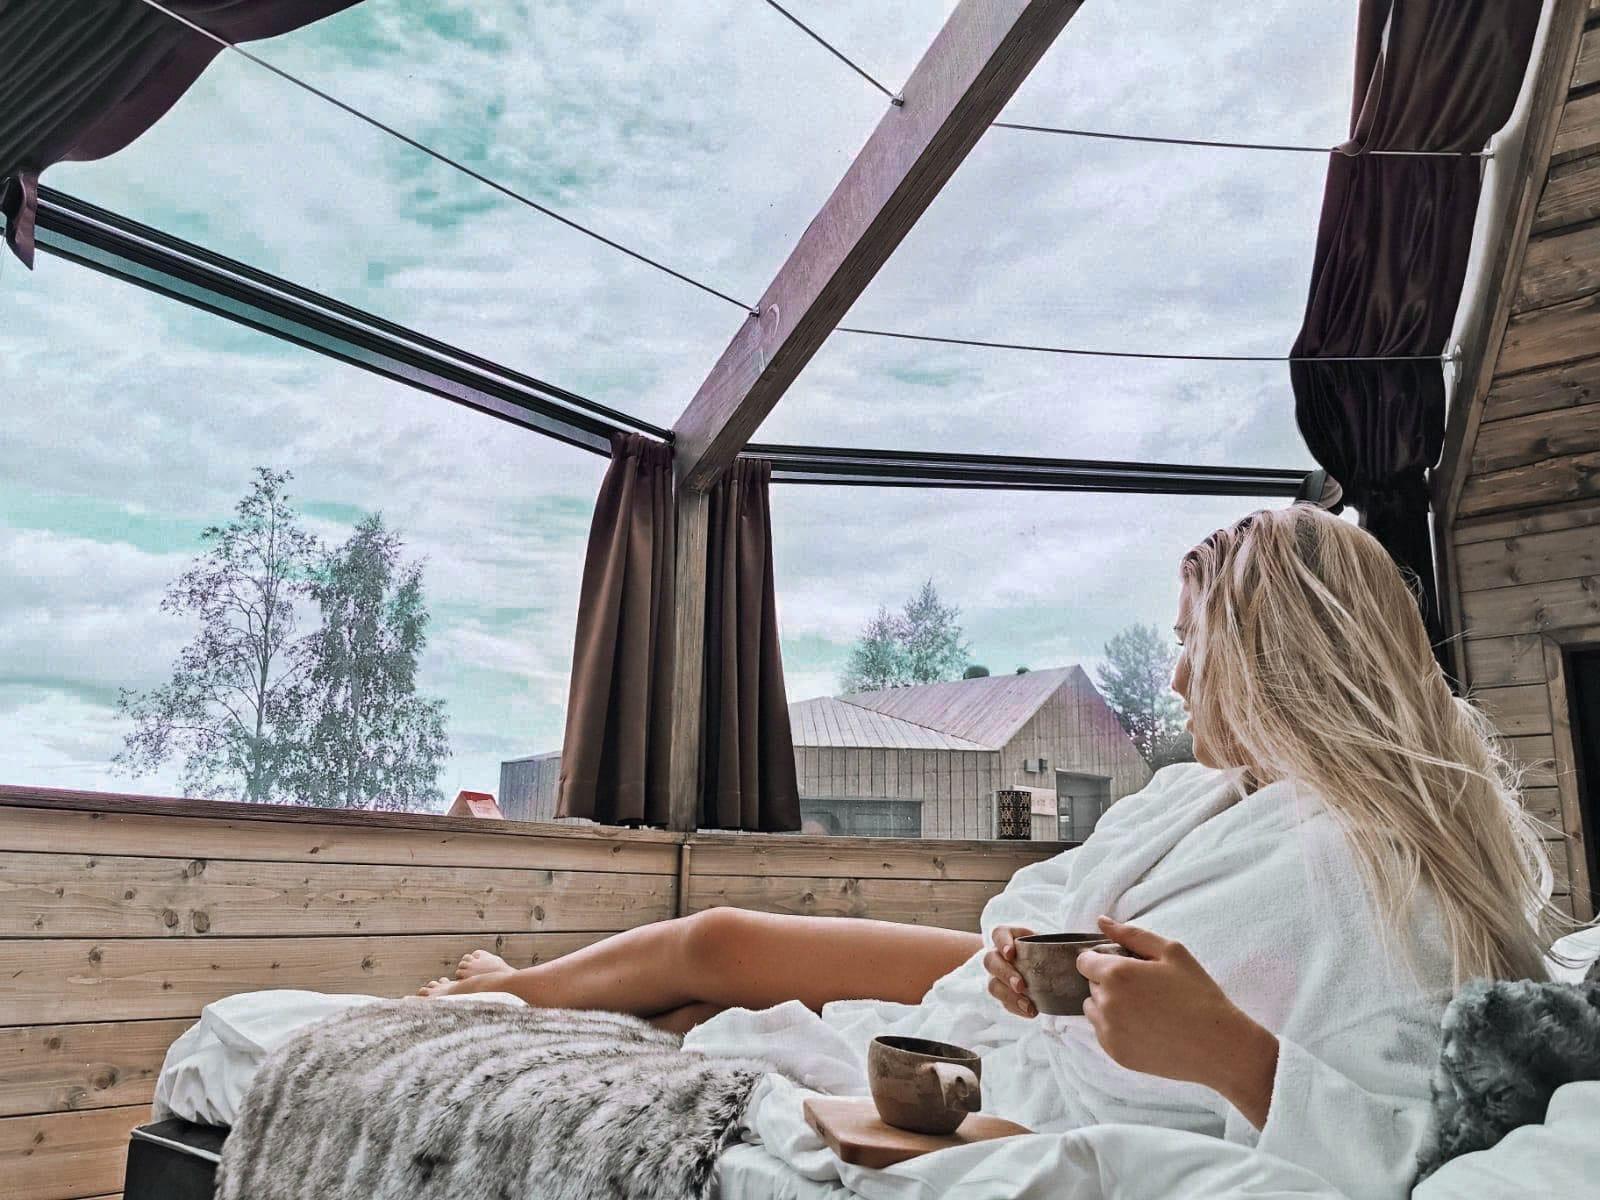 Järvisydän hotel and spa glass igloo room view .jpg